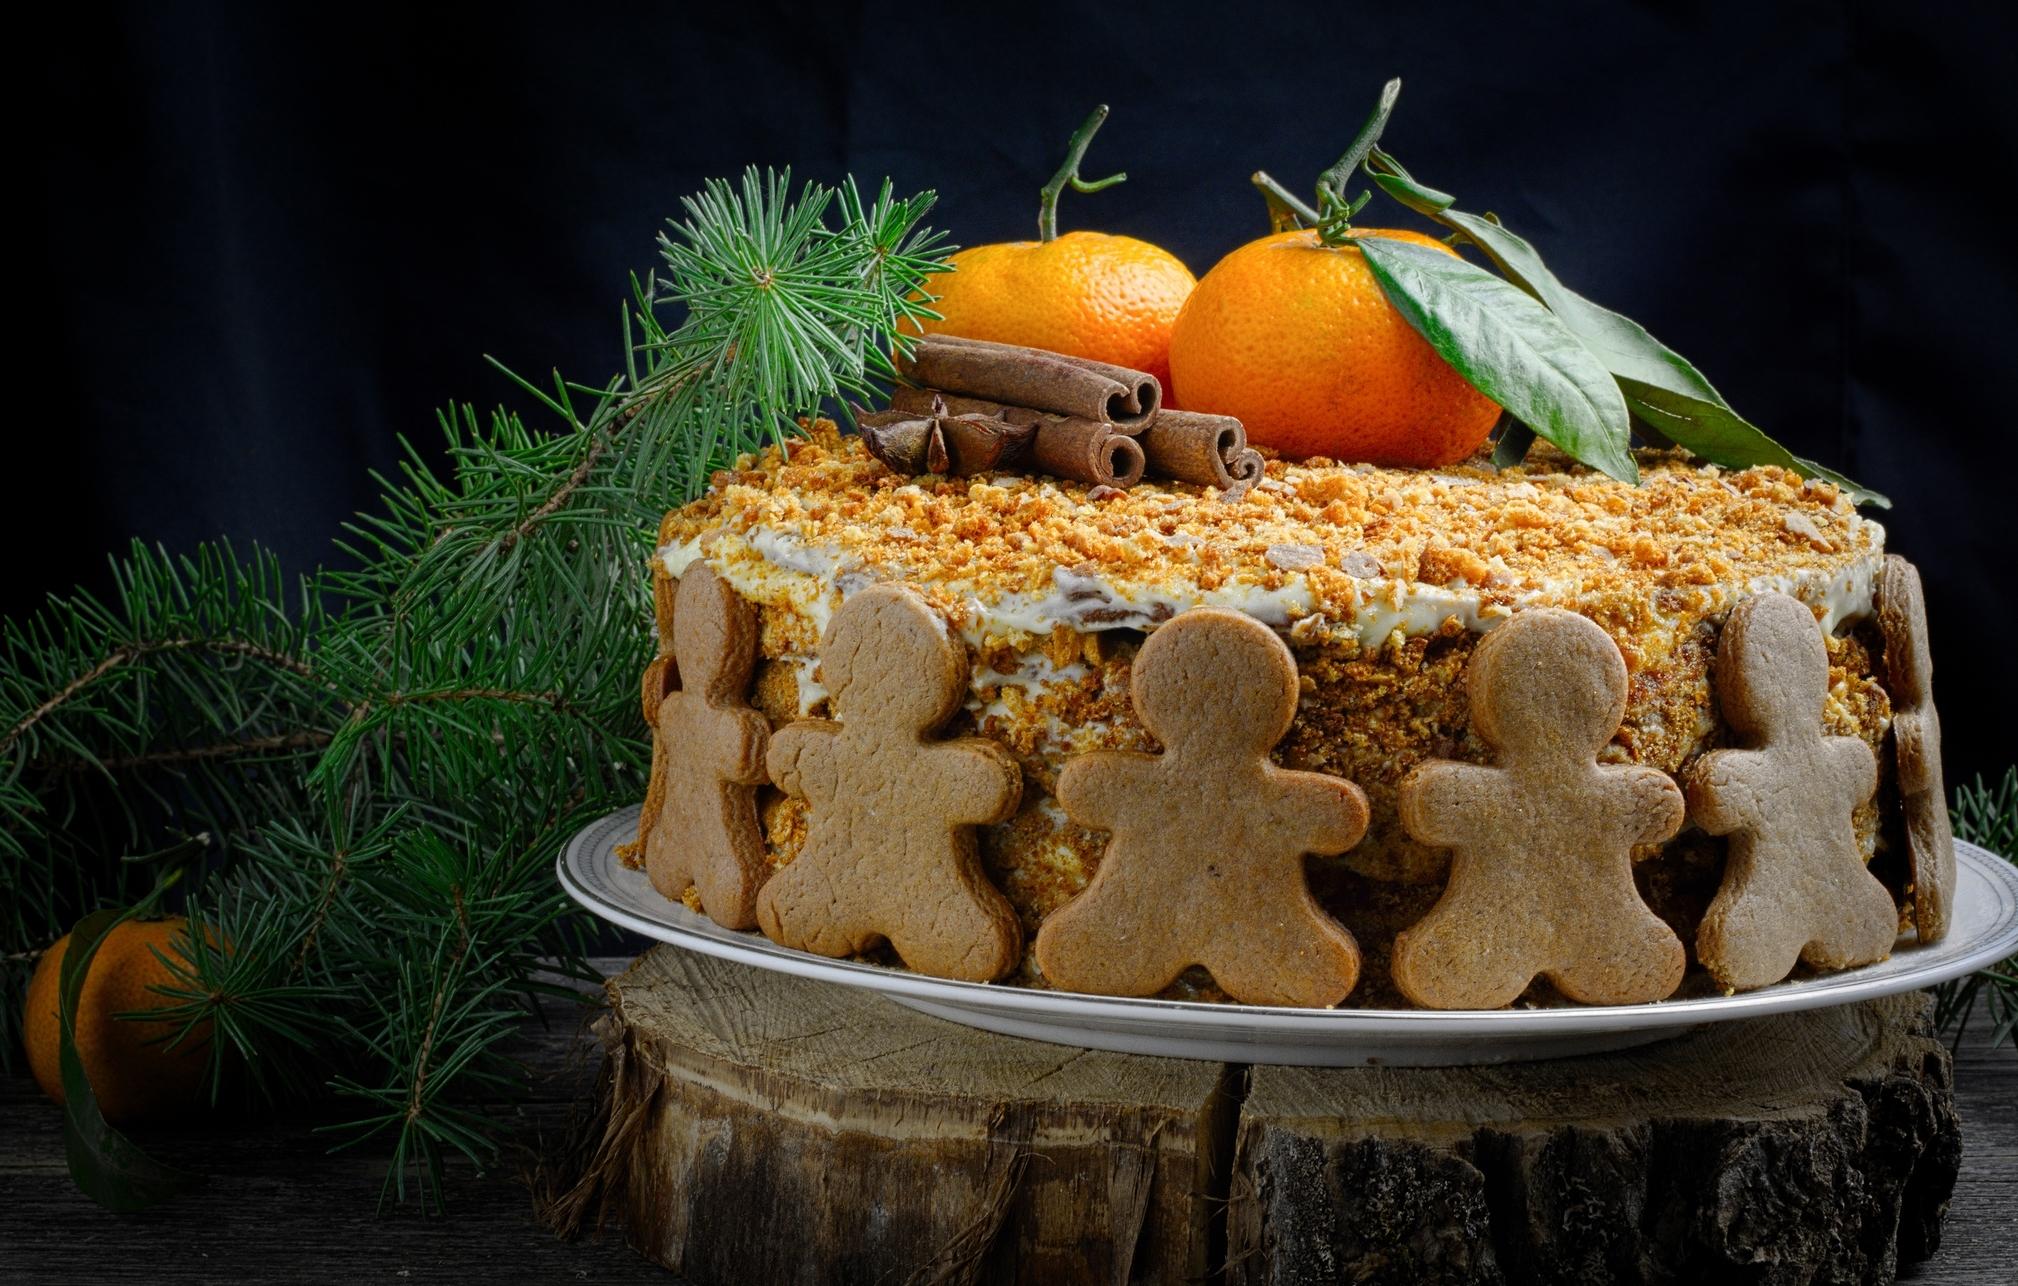 kak-ukrasit-tort-na-novyj-god-2022-foto-16